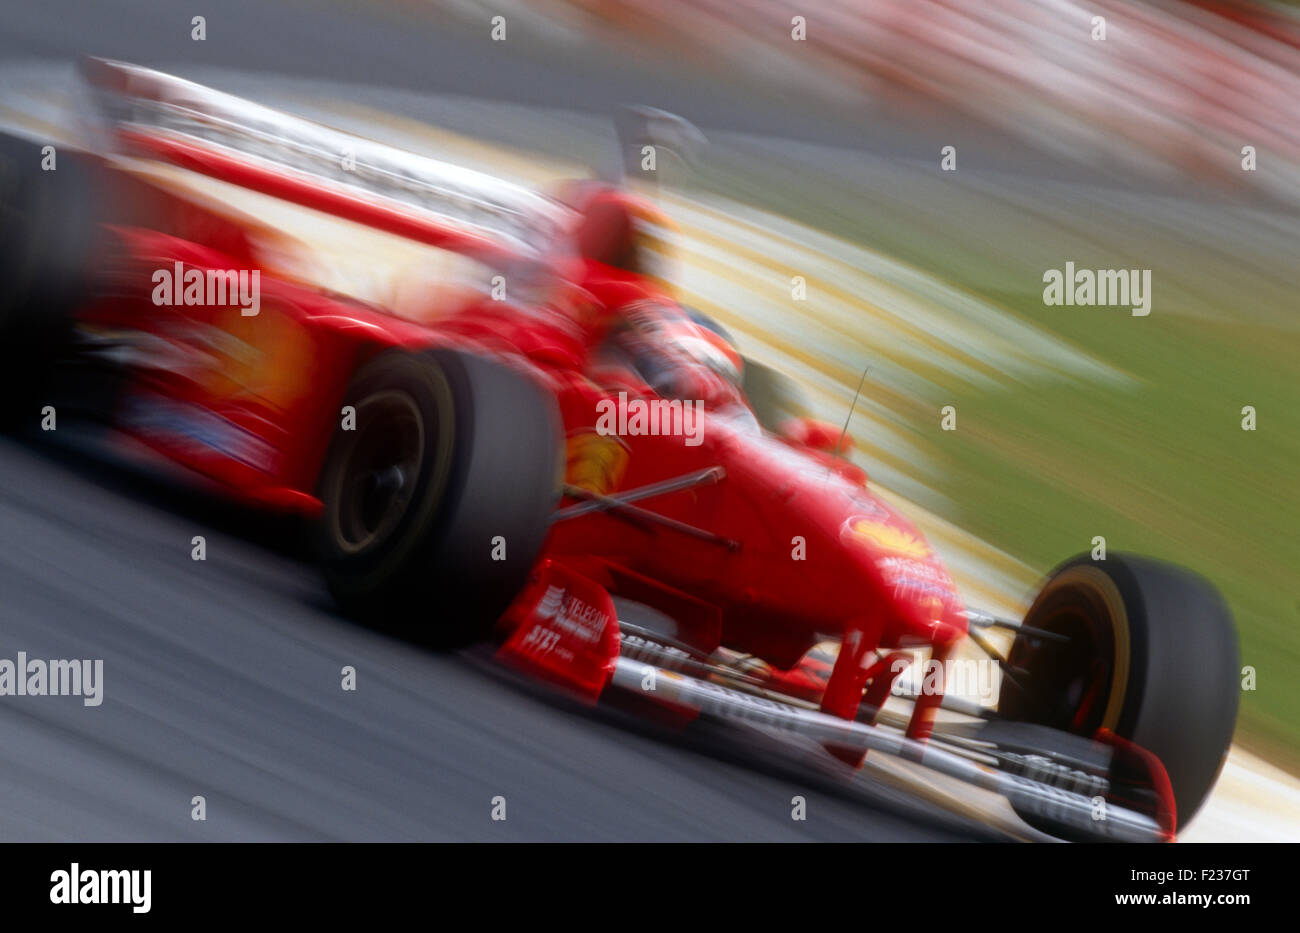 Michael Schumacher in a Ferrari 1990s - Stock Image